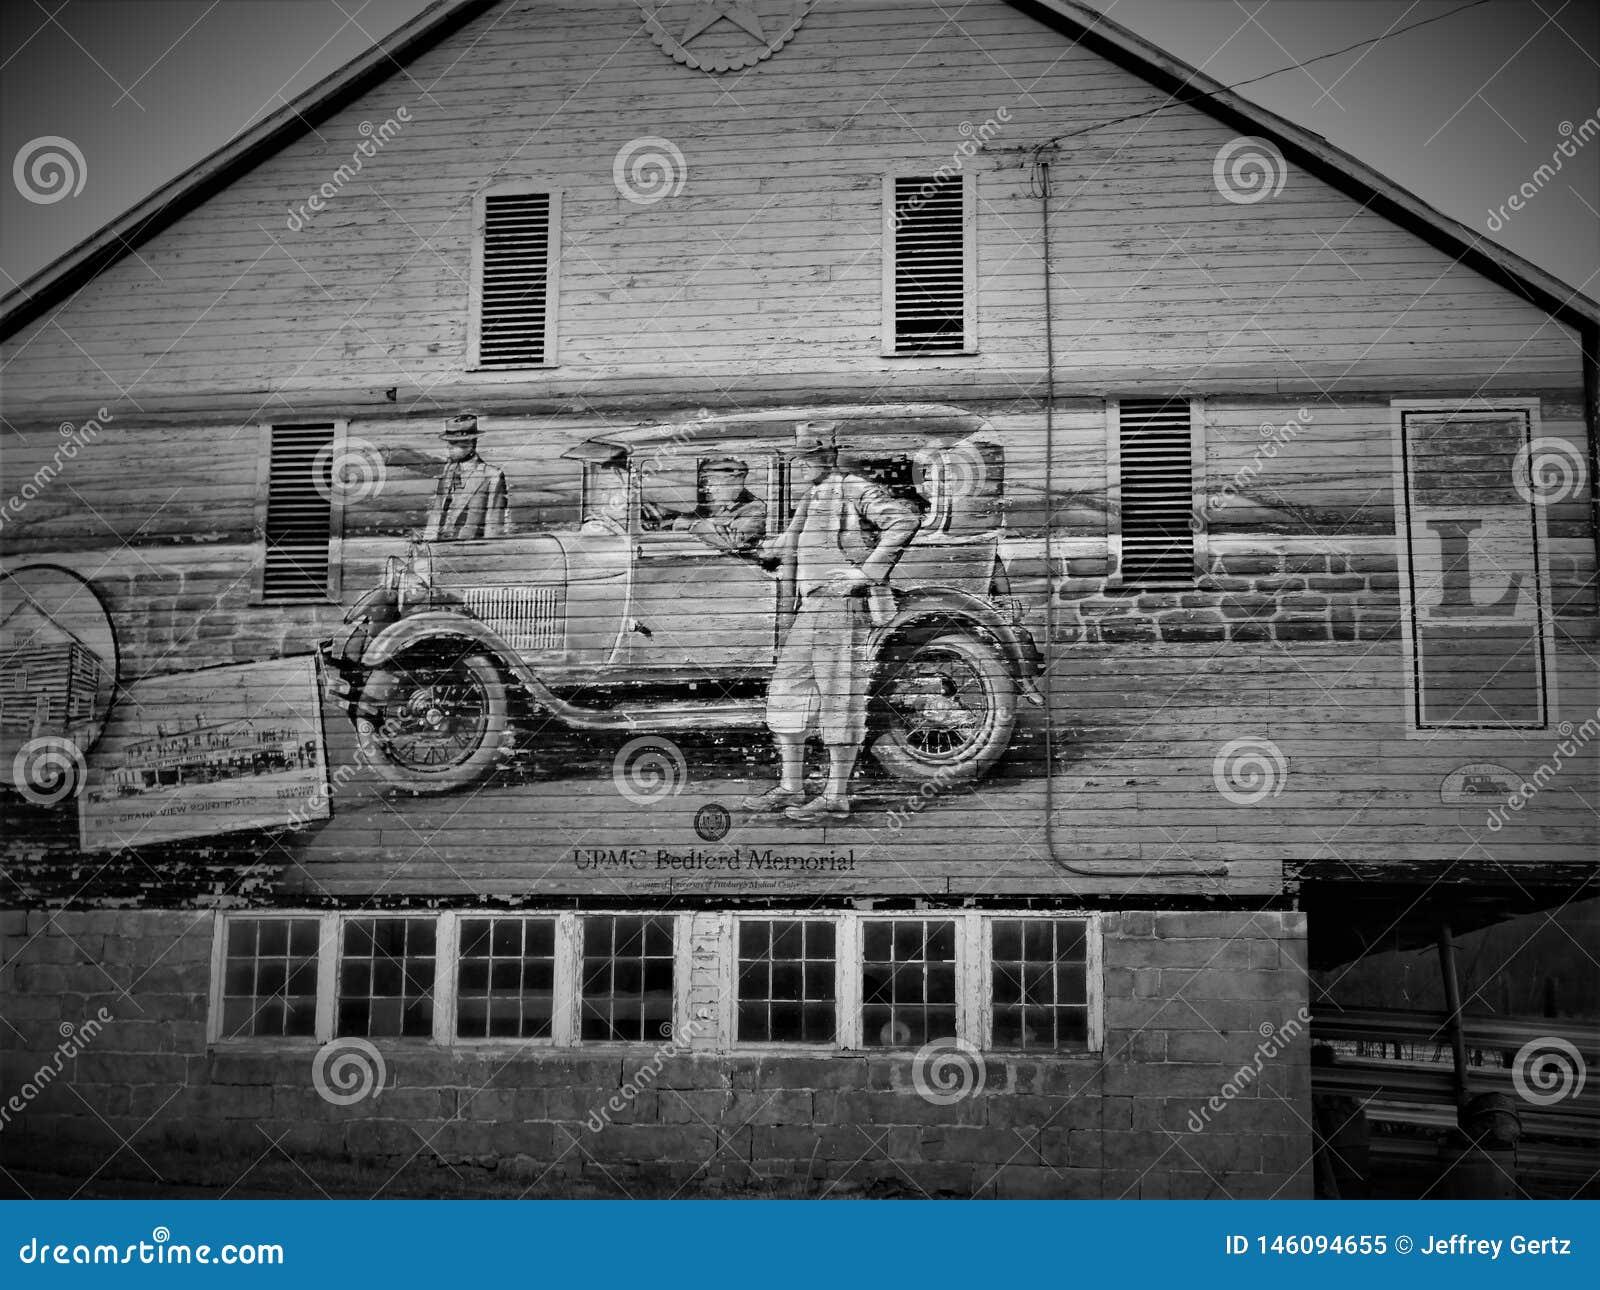 Illustration de bord de la route sur Lincoln Highway en Pennsylvanie occidentale